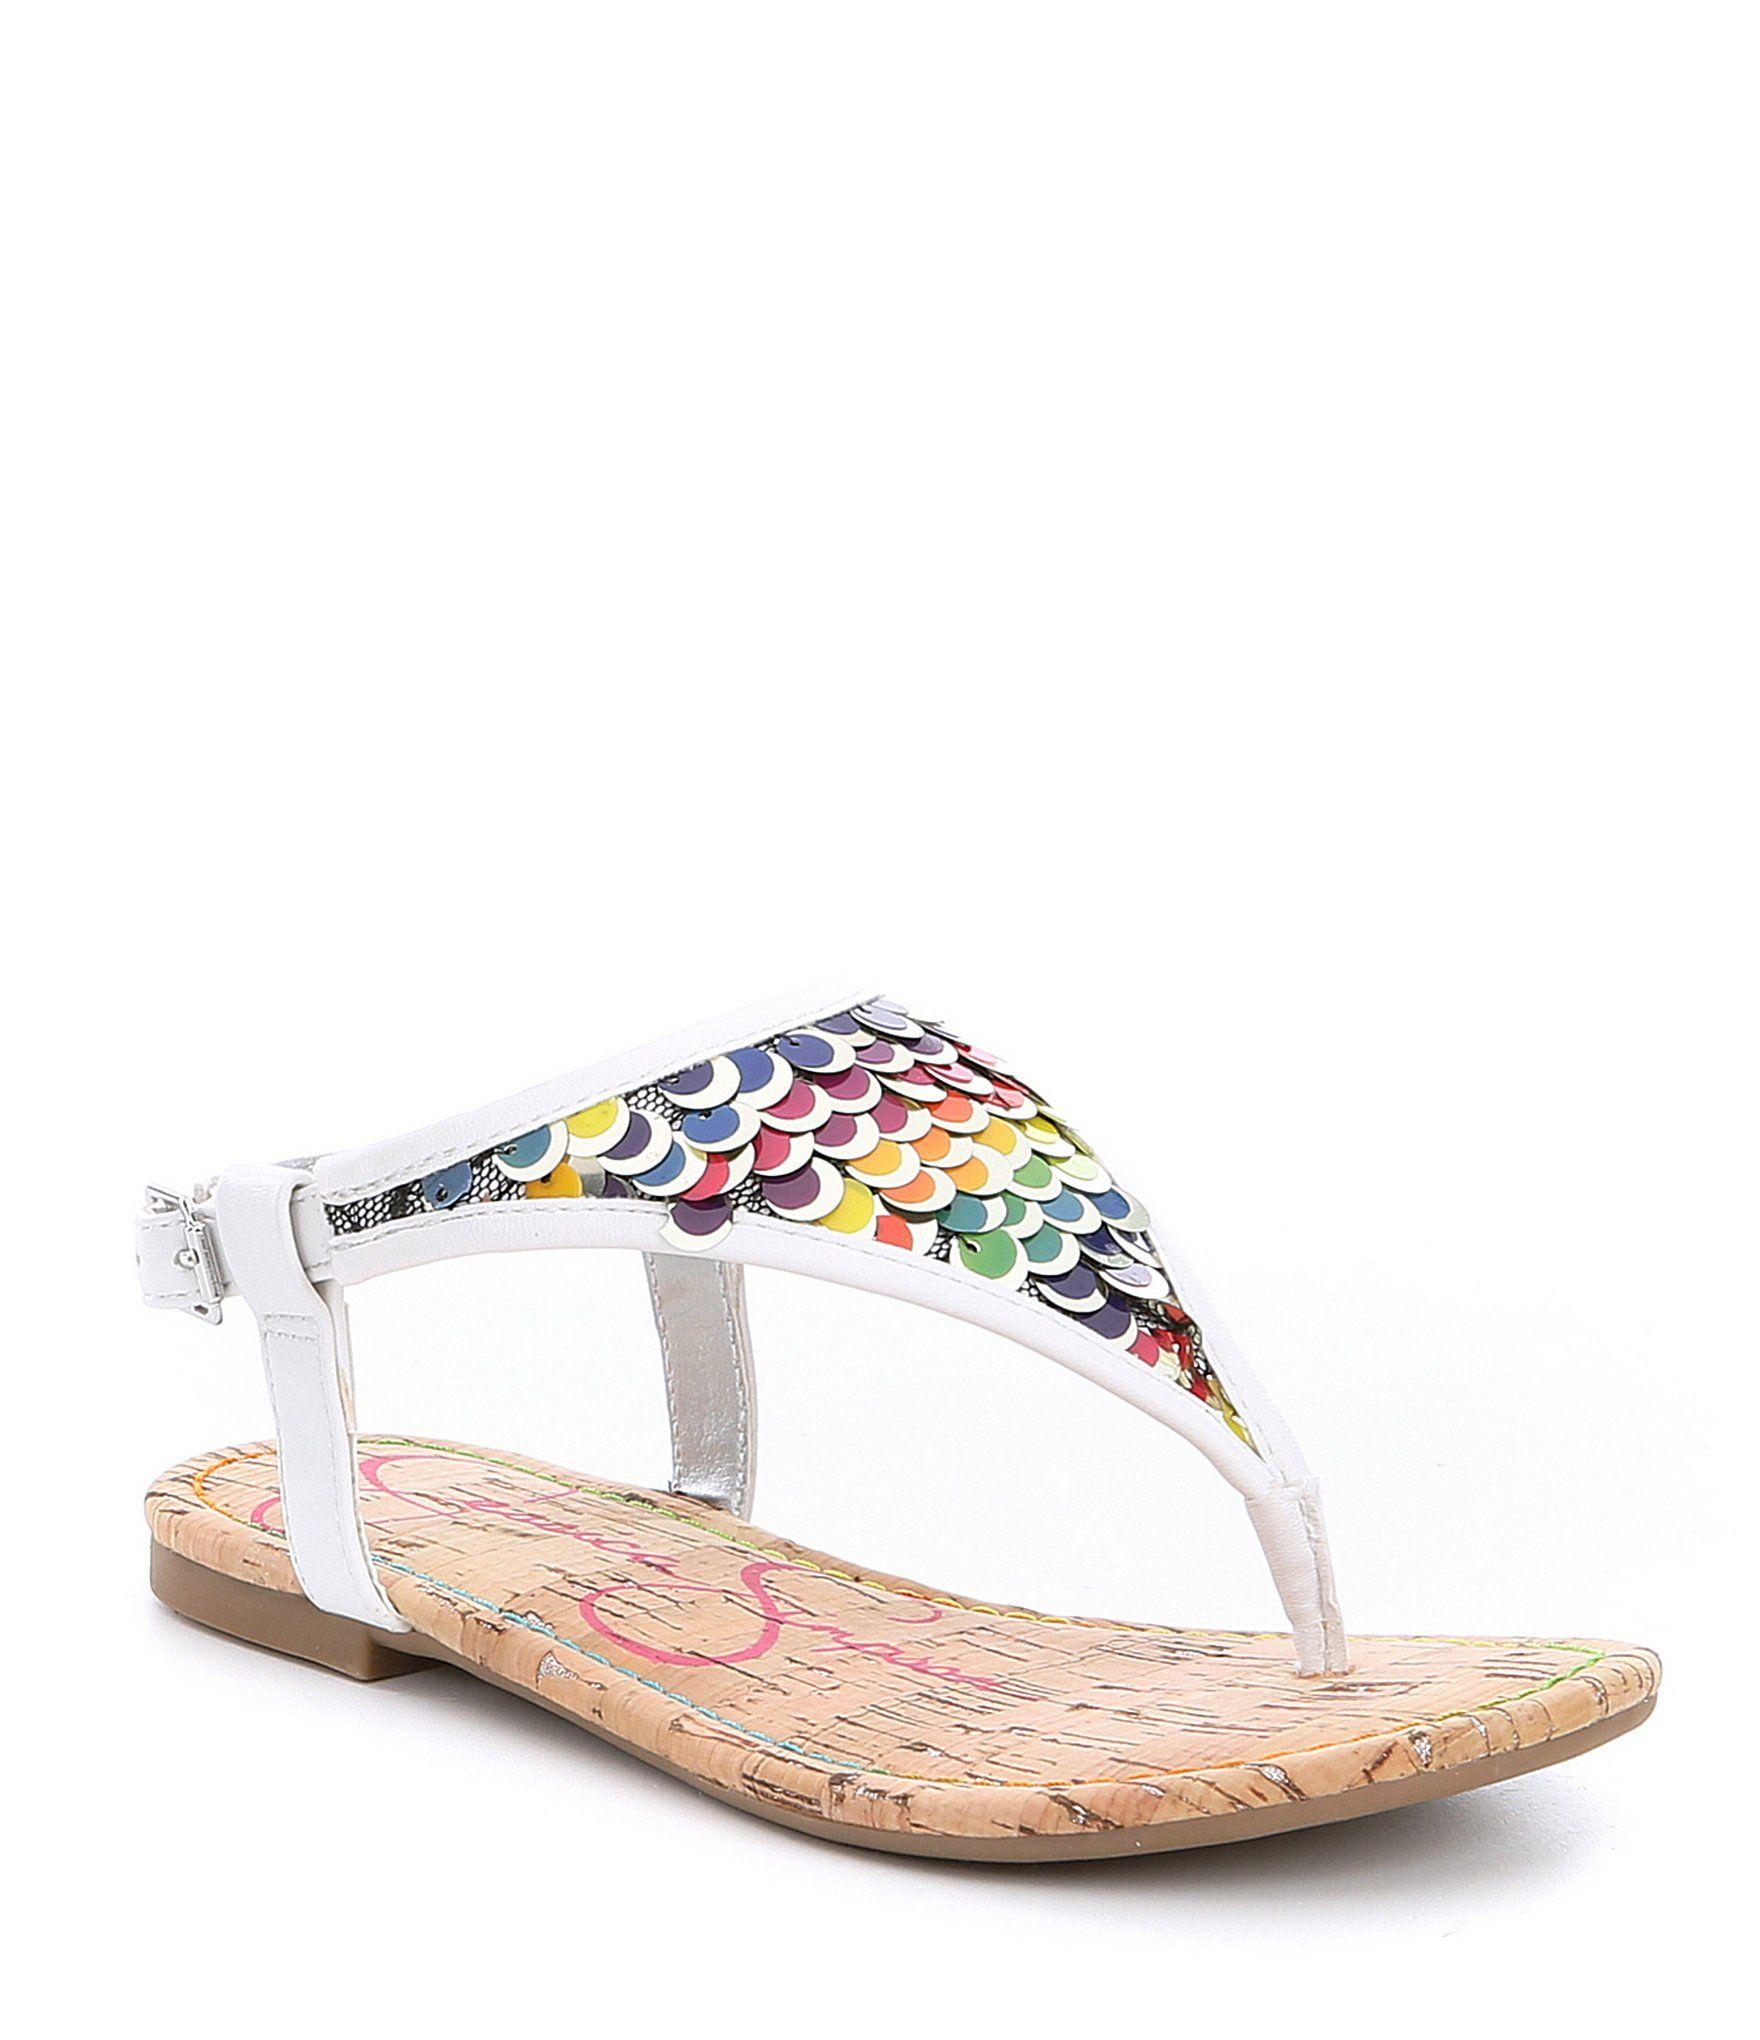 513a10d8f373 Jessica Simpson Girls Kambria Sequin Thong Sandals  Dillards